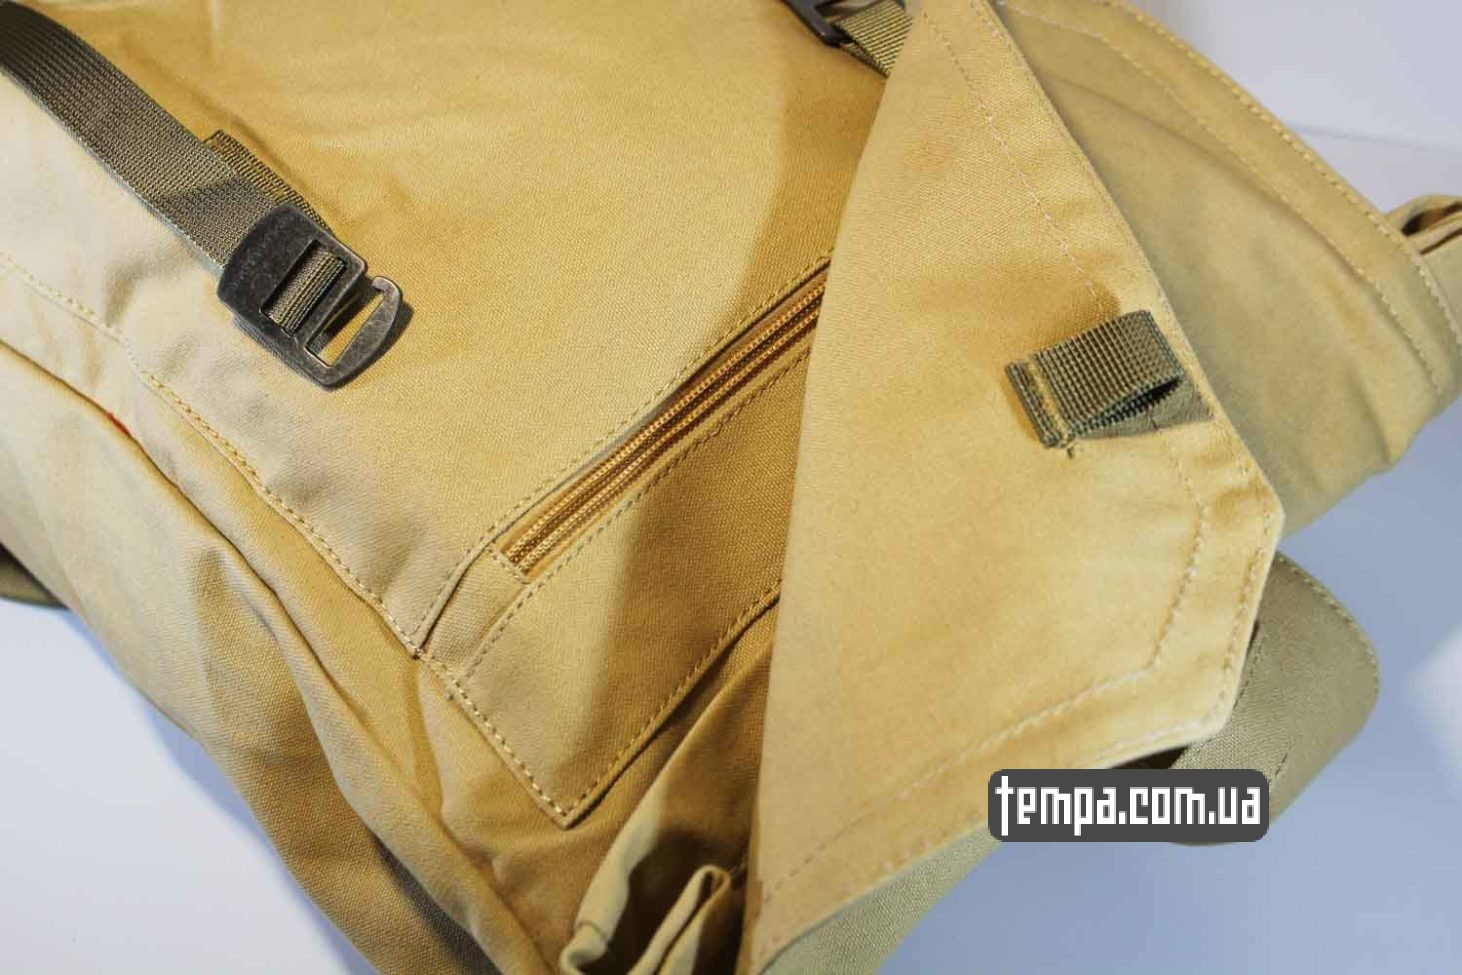 Украина оригинальная одежда рюкзак сумка Fjallraven Foldsack No.1 Backpack бежевый